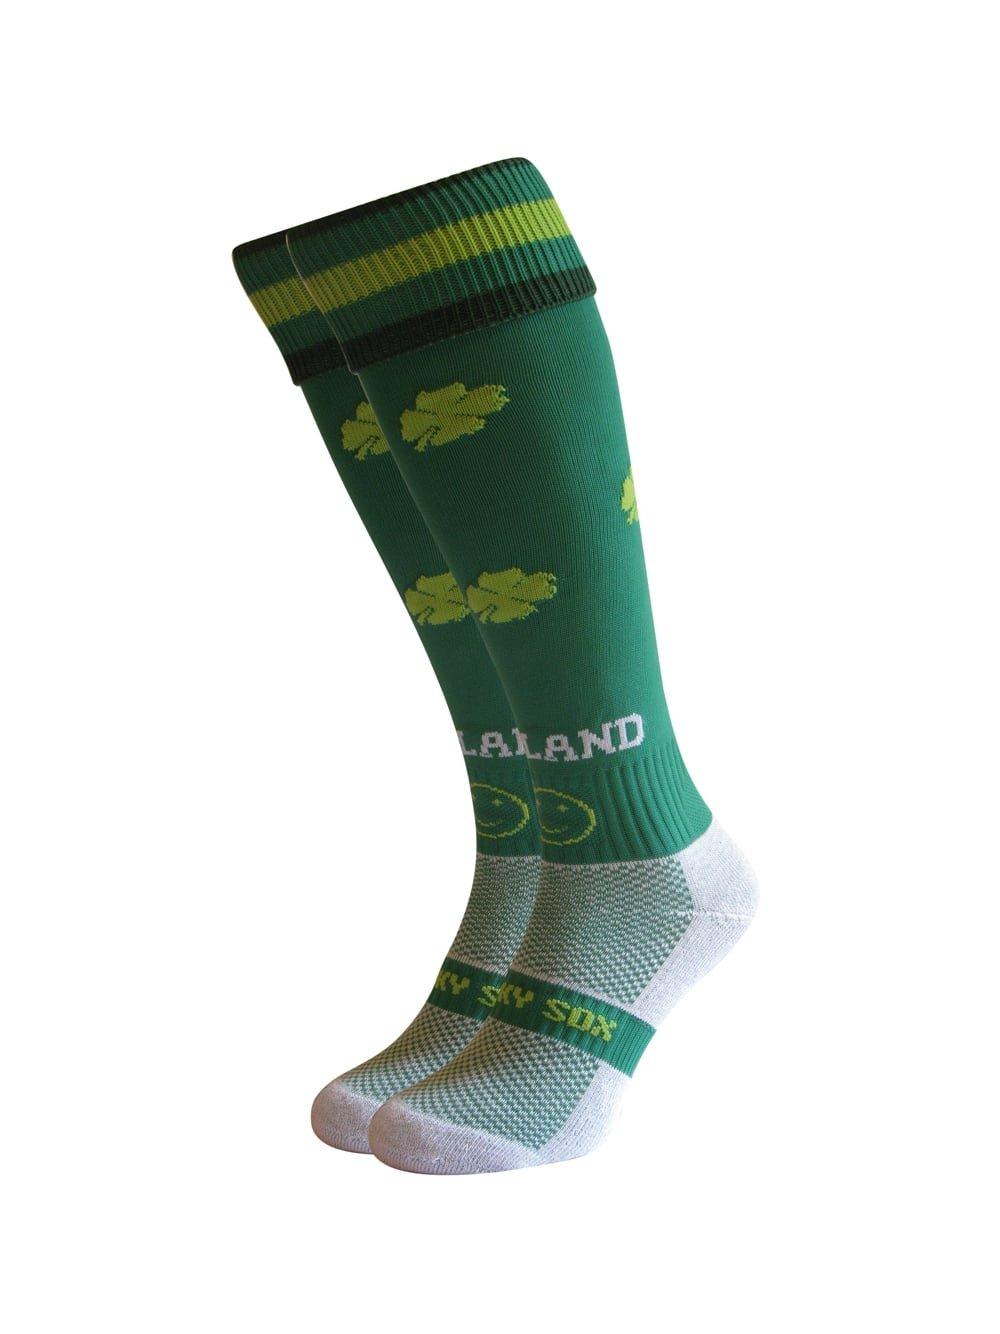 Wacky Sox Calzini sportivi Irlanda Adult Shoe Size 11-14